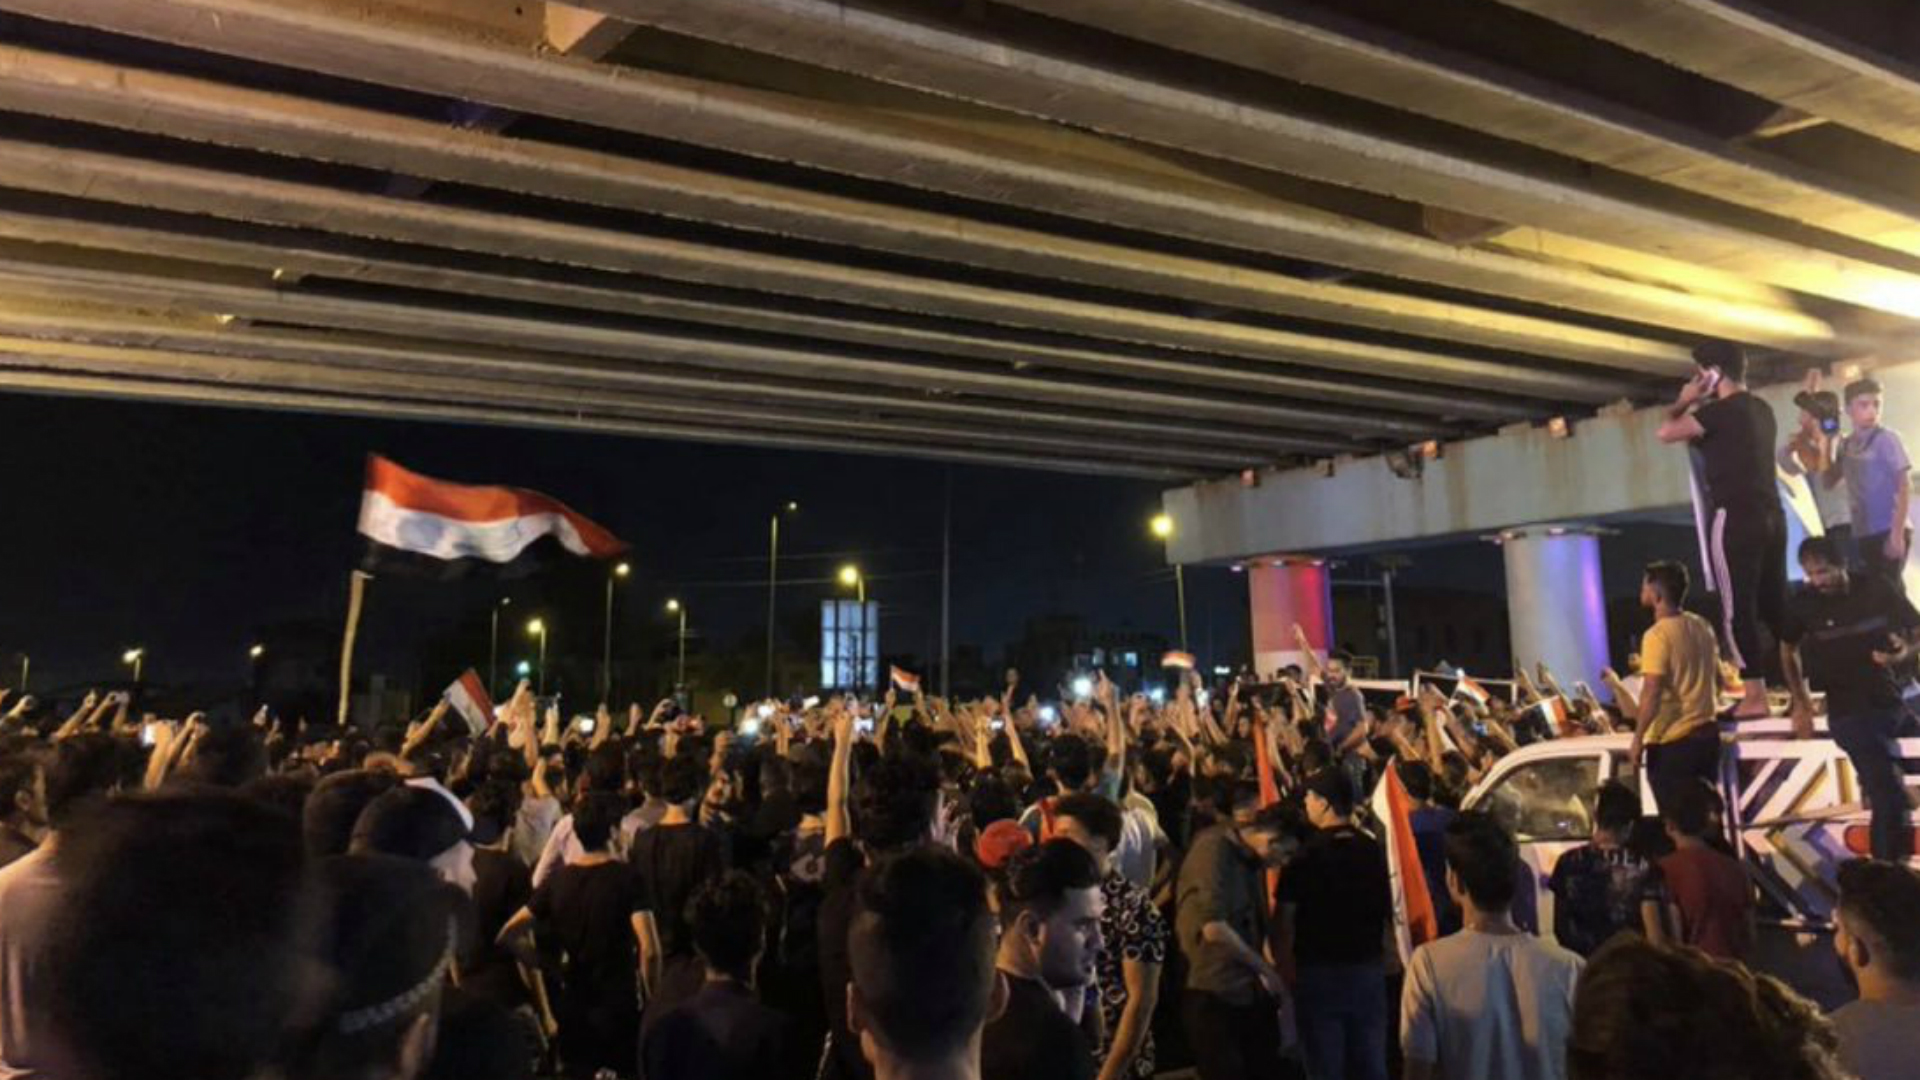 متظاهرو بغداد يبدأون اعتصاماً مفتوحاً